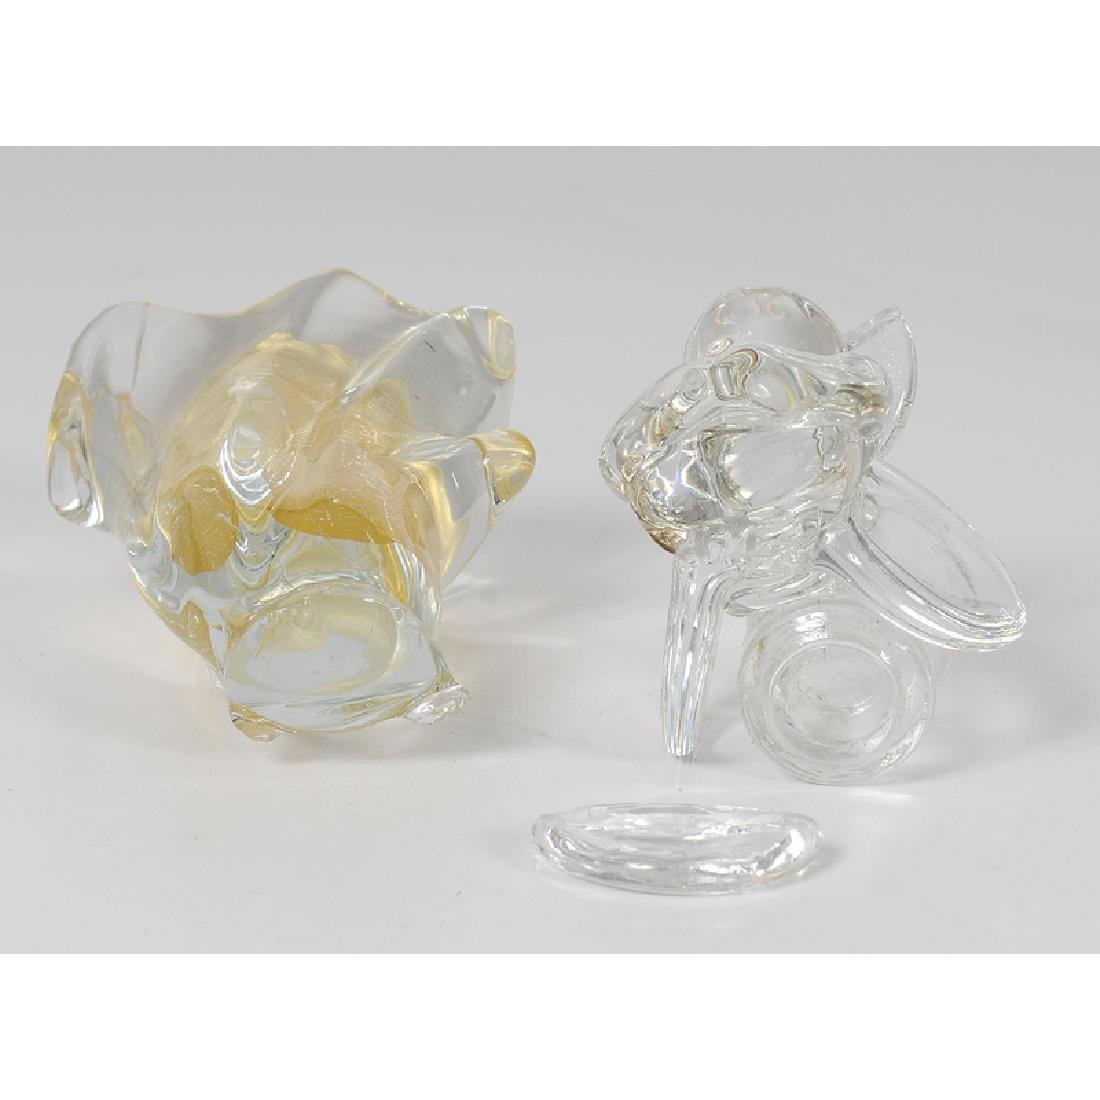 Assorted Glass and Ceramic Decorative Items Including - 2